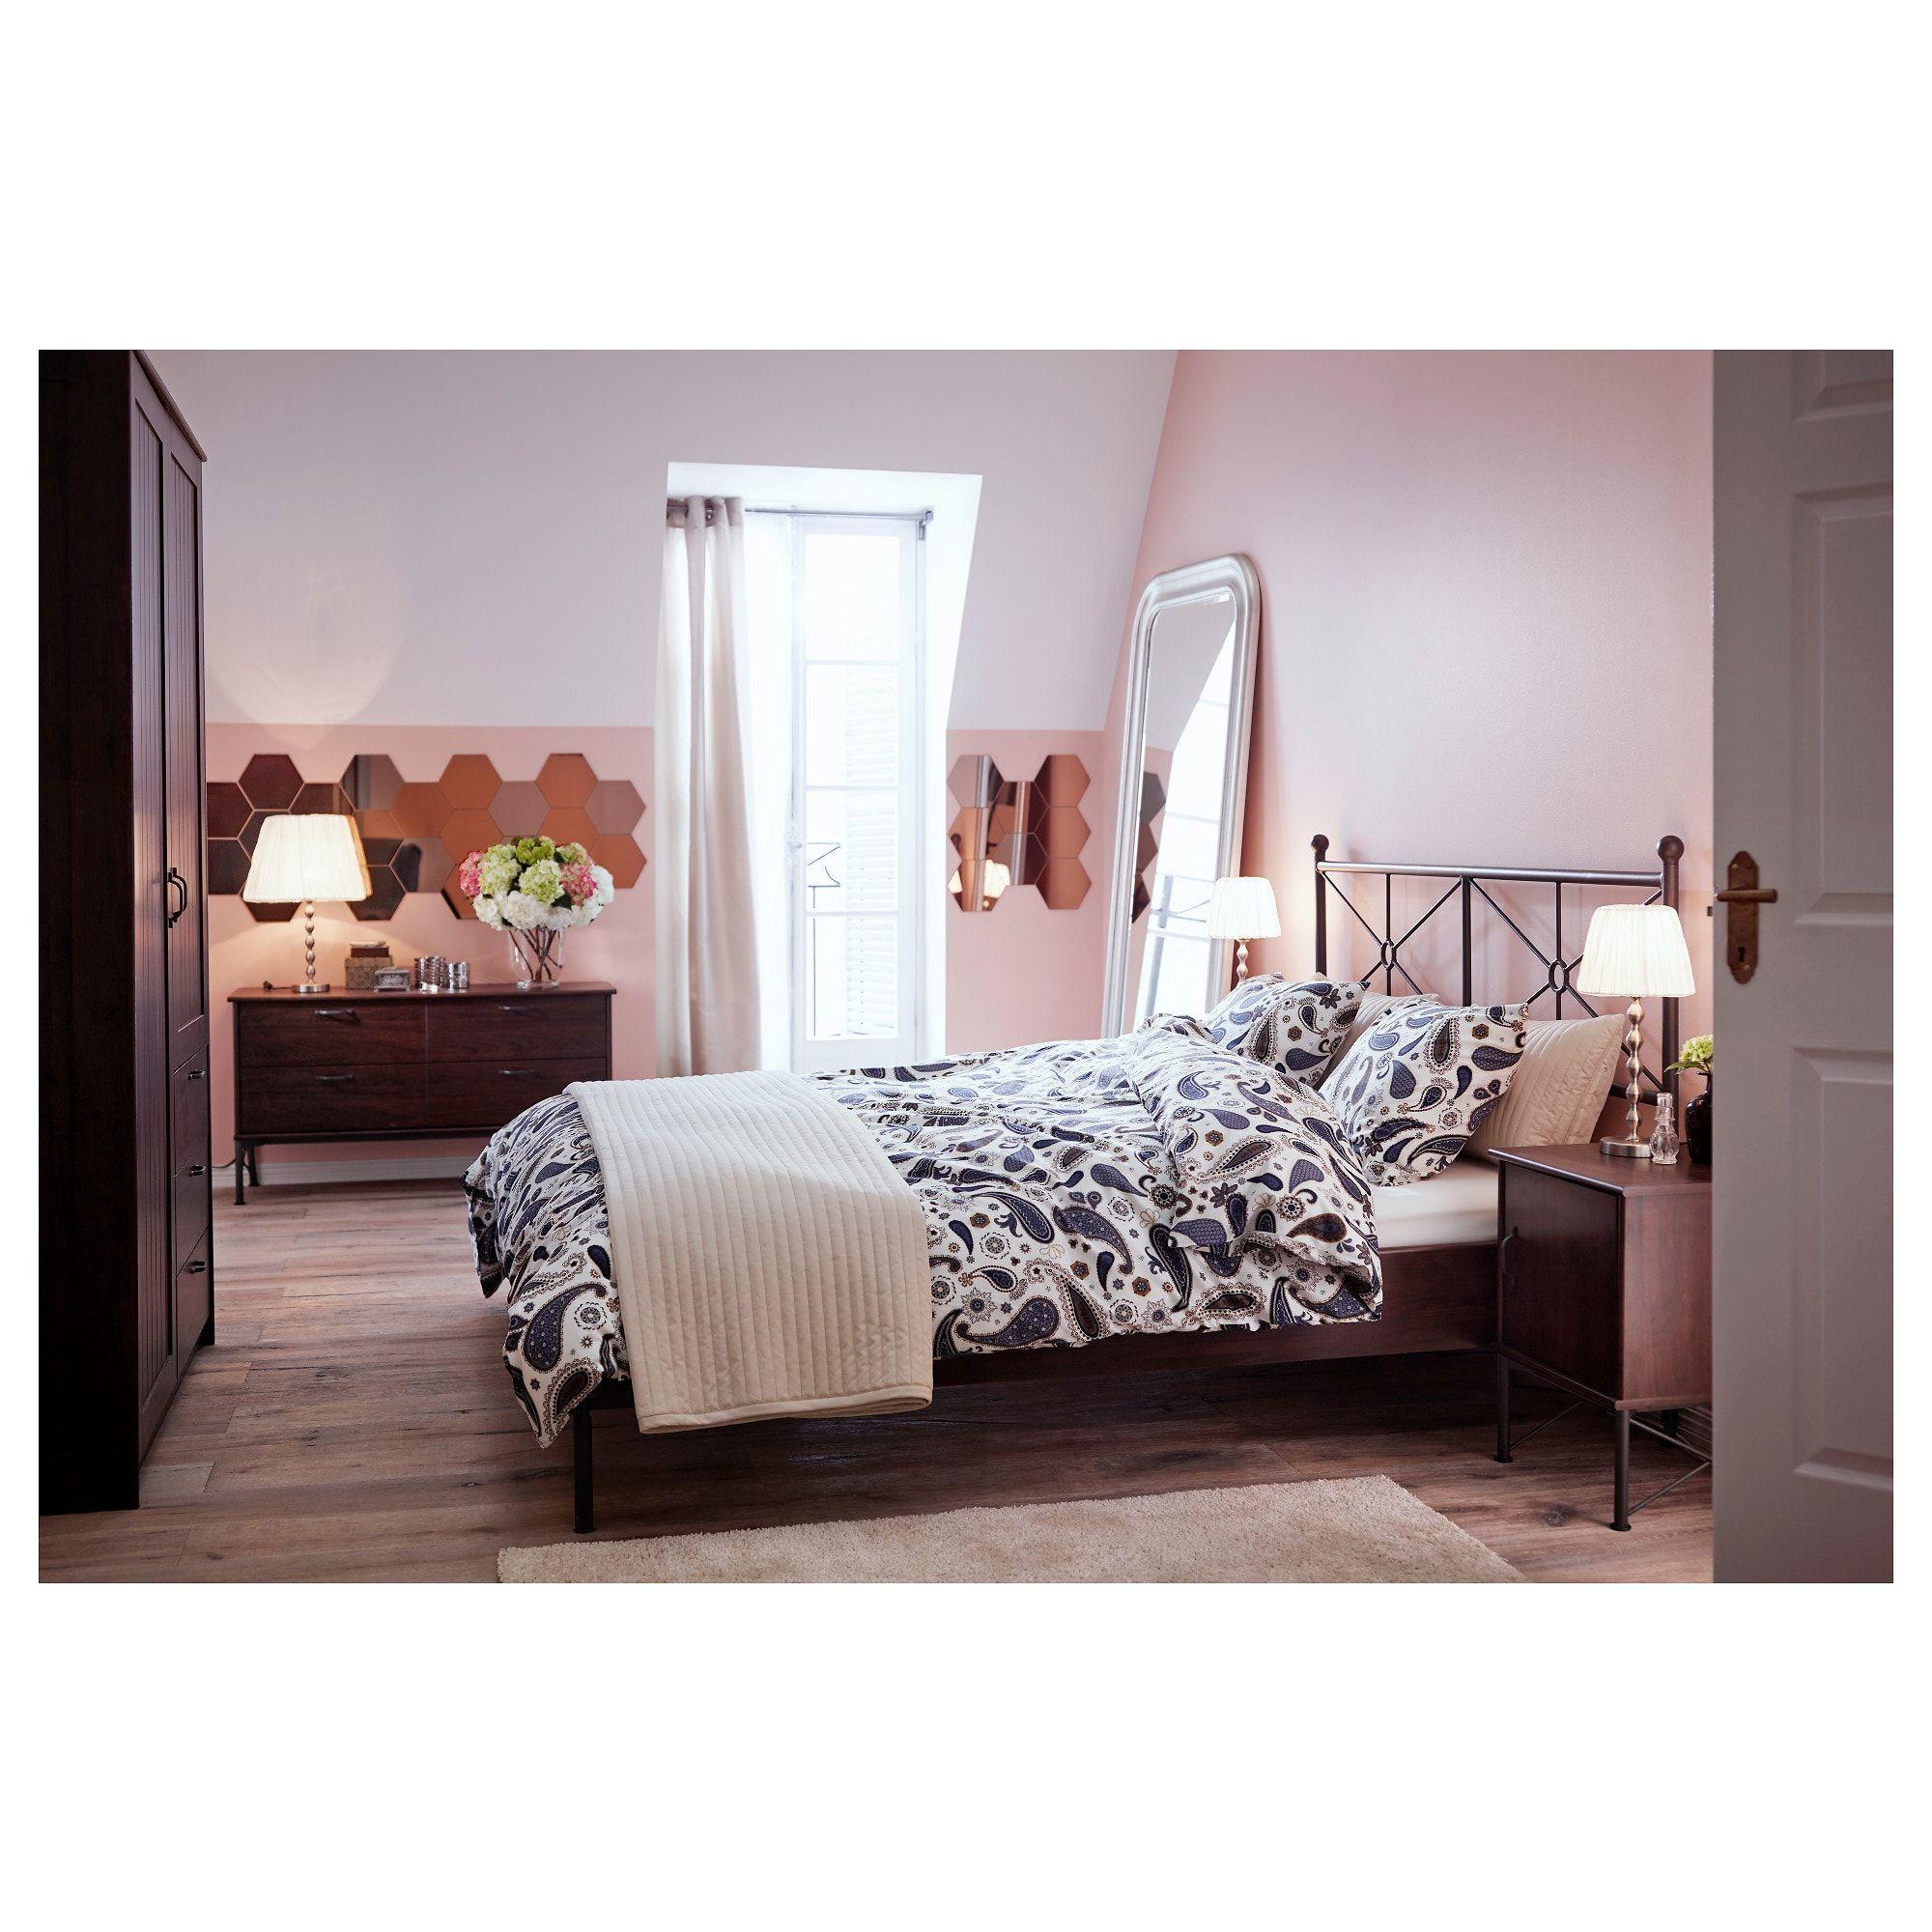 HÖNEFOSS Mirror, 18x21 cm 10 pack Home decor catalogs